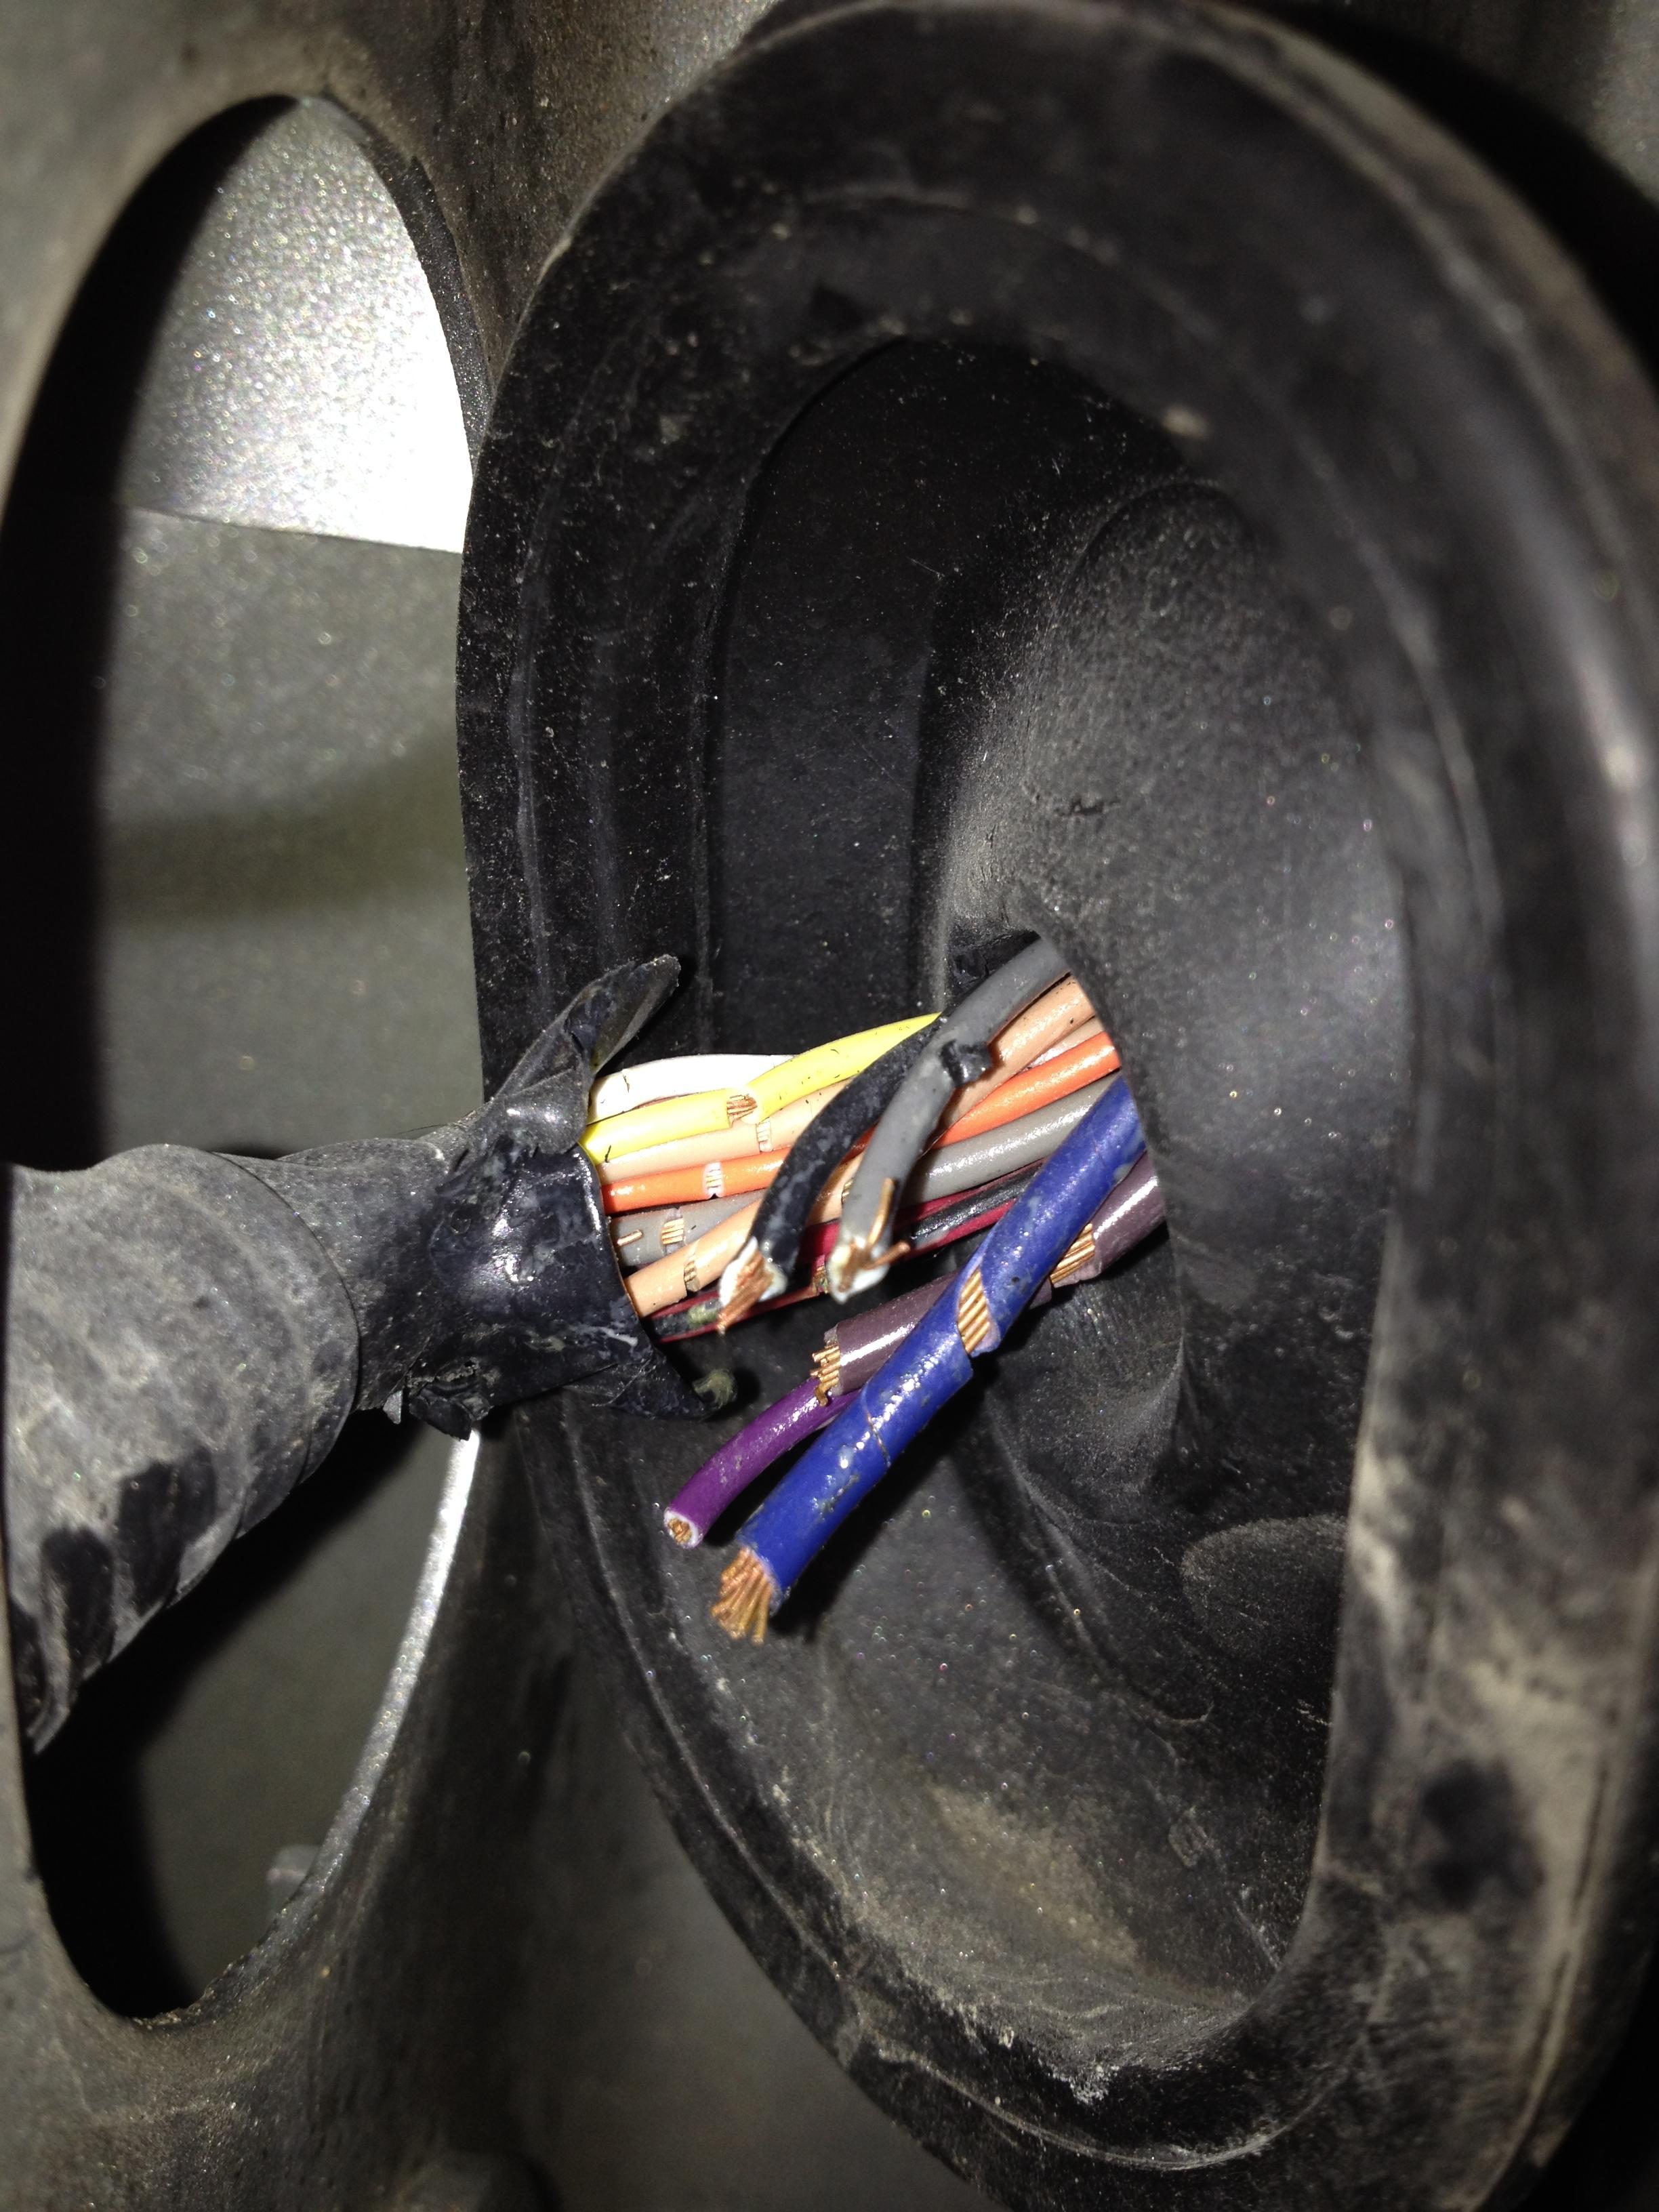 2004 Jeep Grand Cherokee Wiring Schematic Pontiac Torrent Door Wiring Harness Problem Car Forums